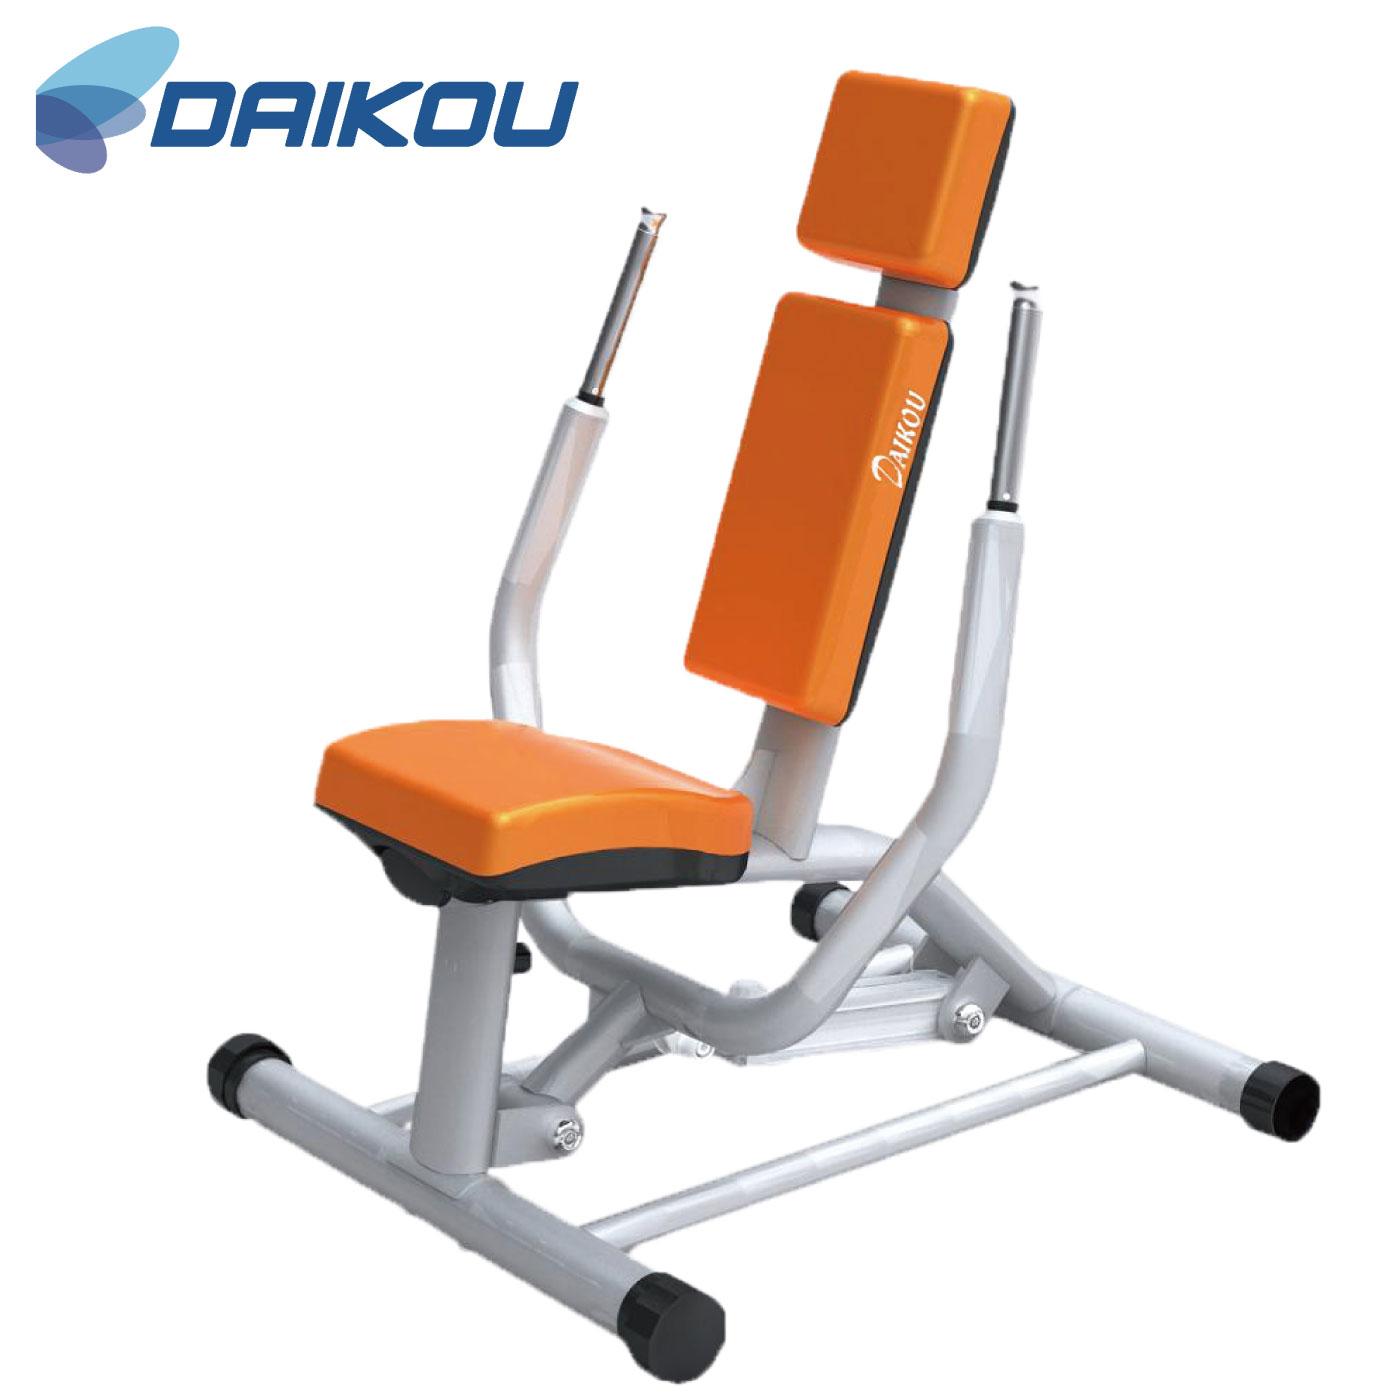 DK-1201(チェストプレス・ロー)/準業務用油圧マシン《DAIKOU(ダイコー)》